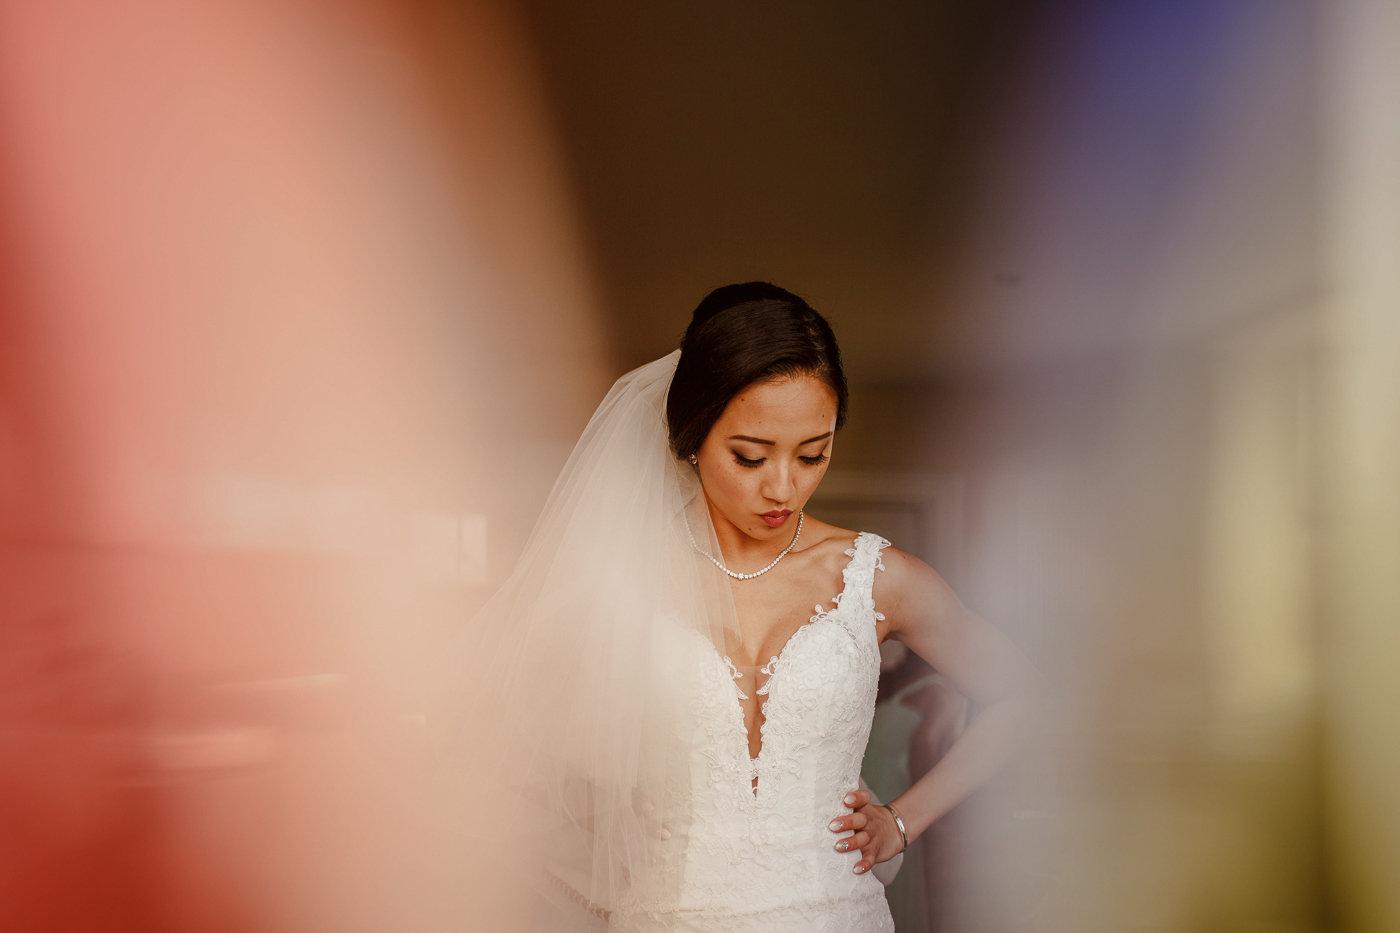 froyle-park-wedding-photography-11.jpg